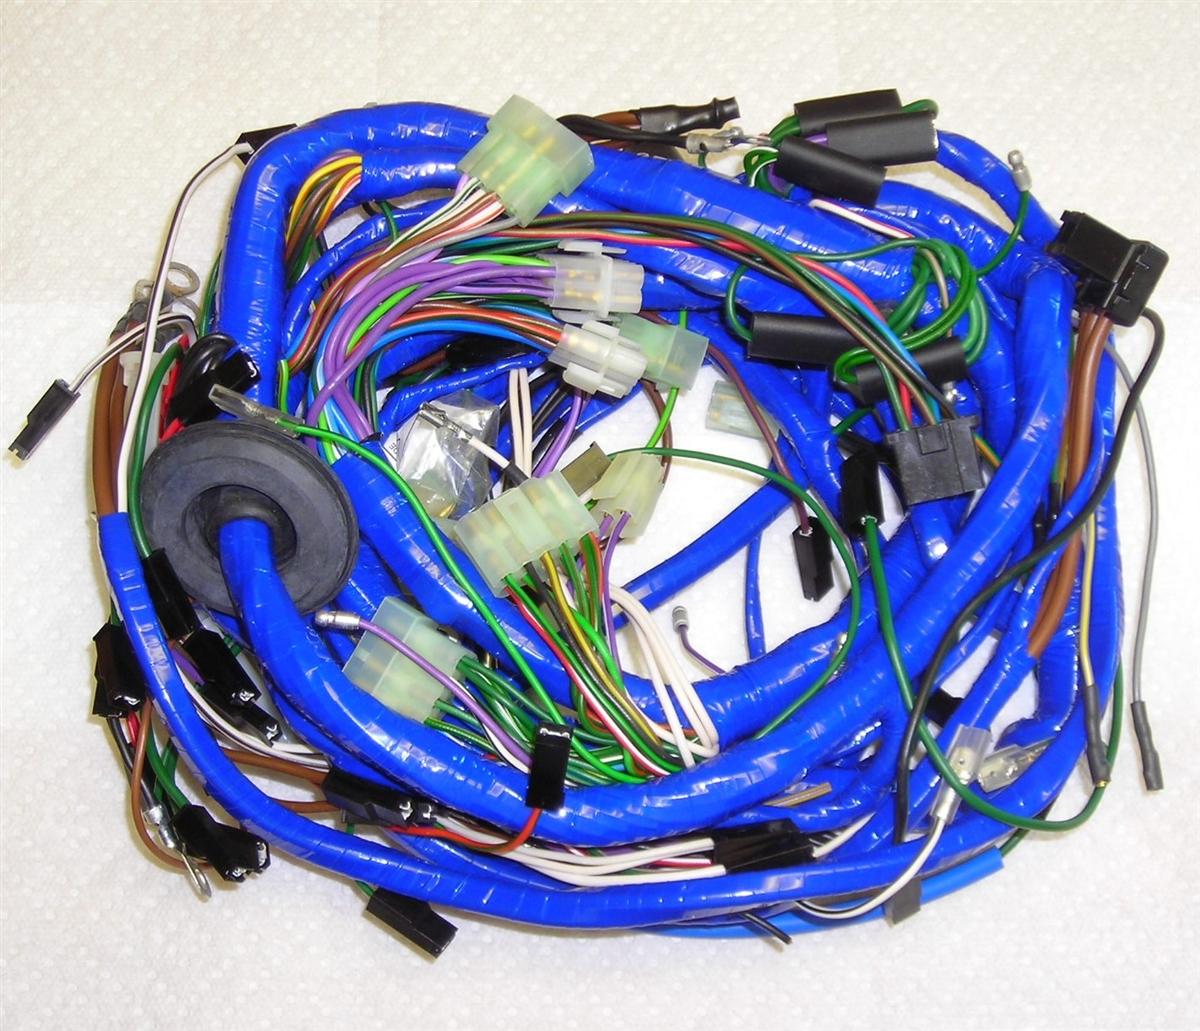 mgb 1980 main wiring harness 522